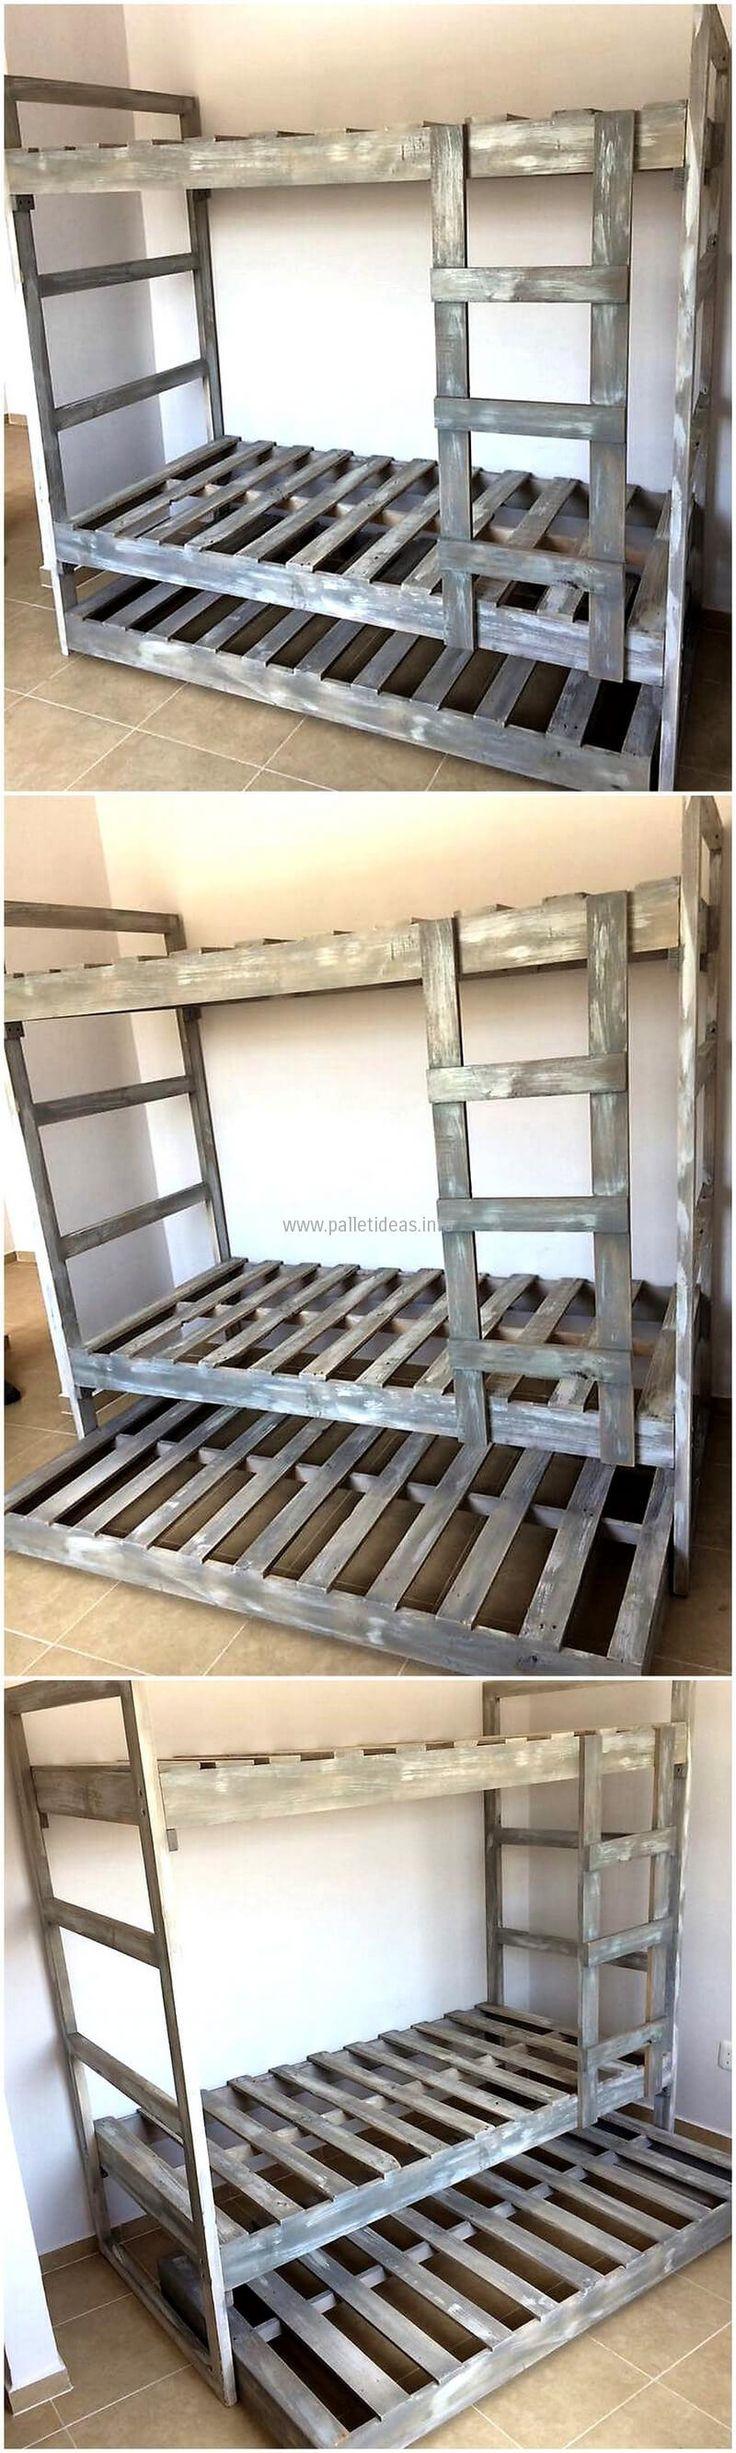 Best 25 Pallet Bunk Beds Ideas On Pinterest Bunk Bed